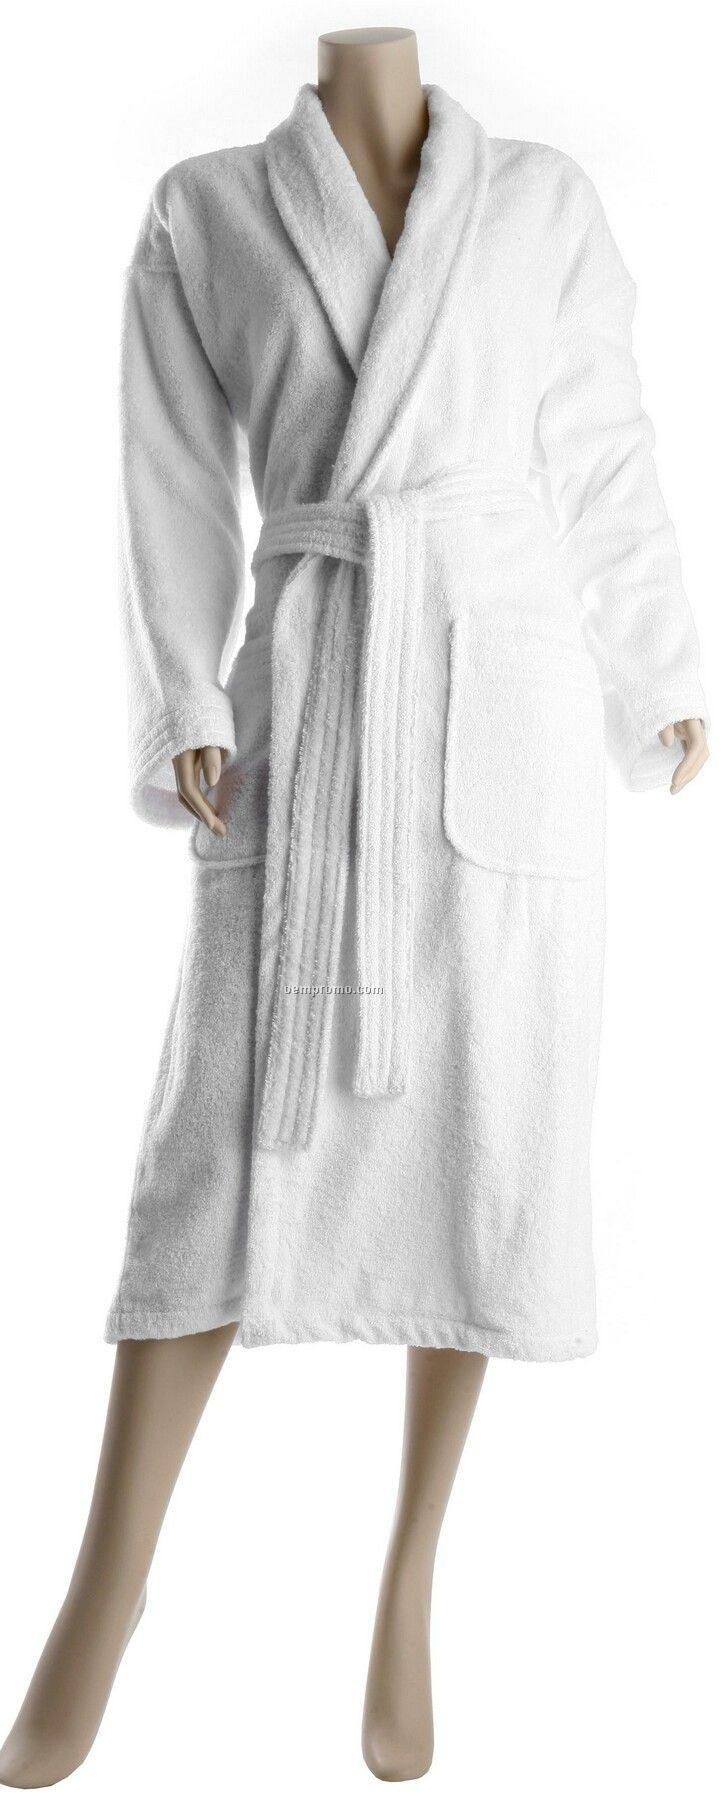 "48"" Luxury Loop Terry Pleat Back Hotel Shawl Collar Robe"